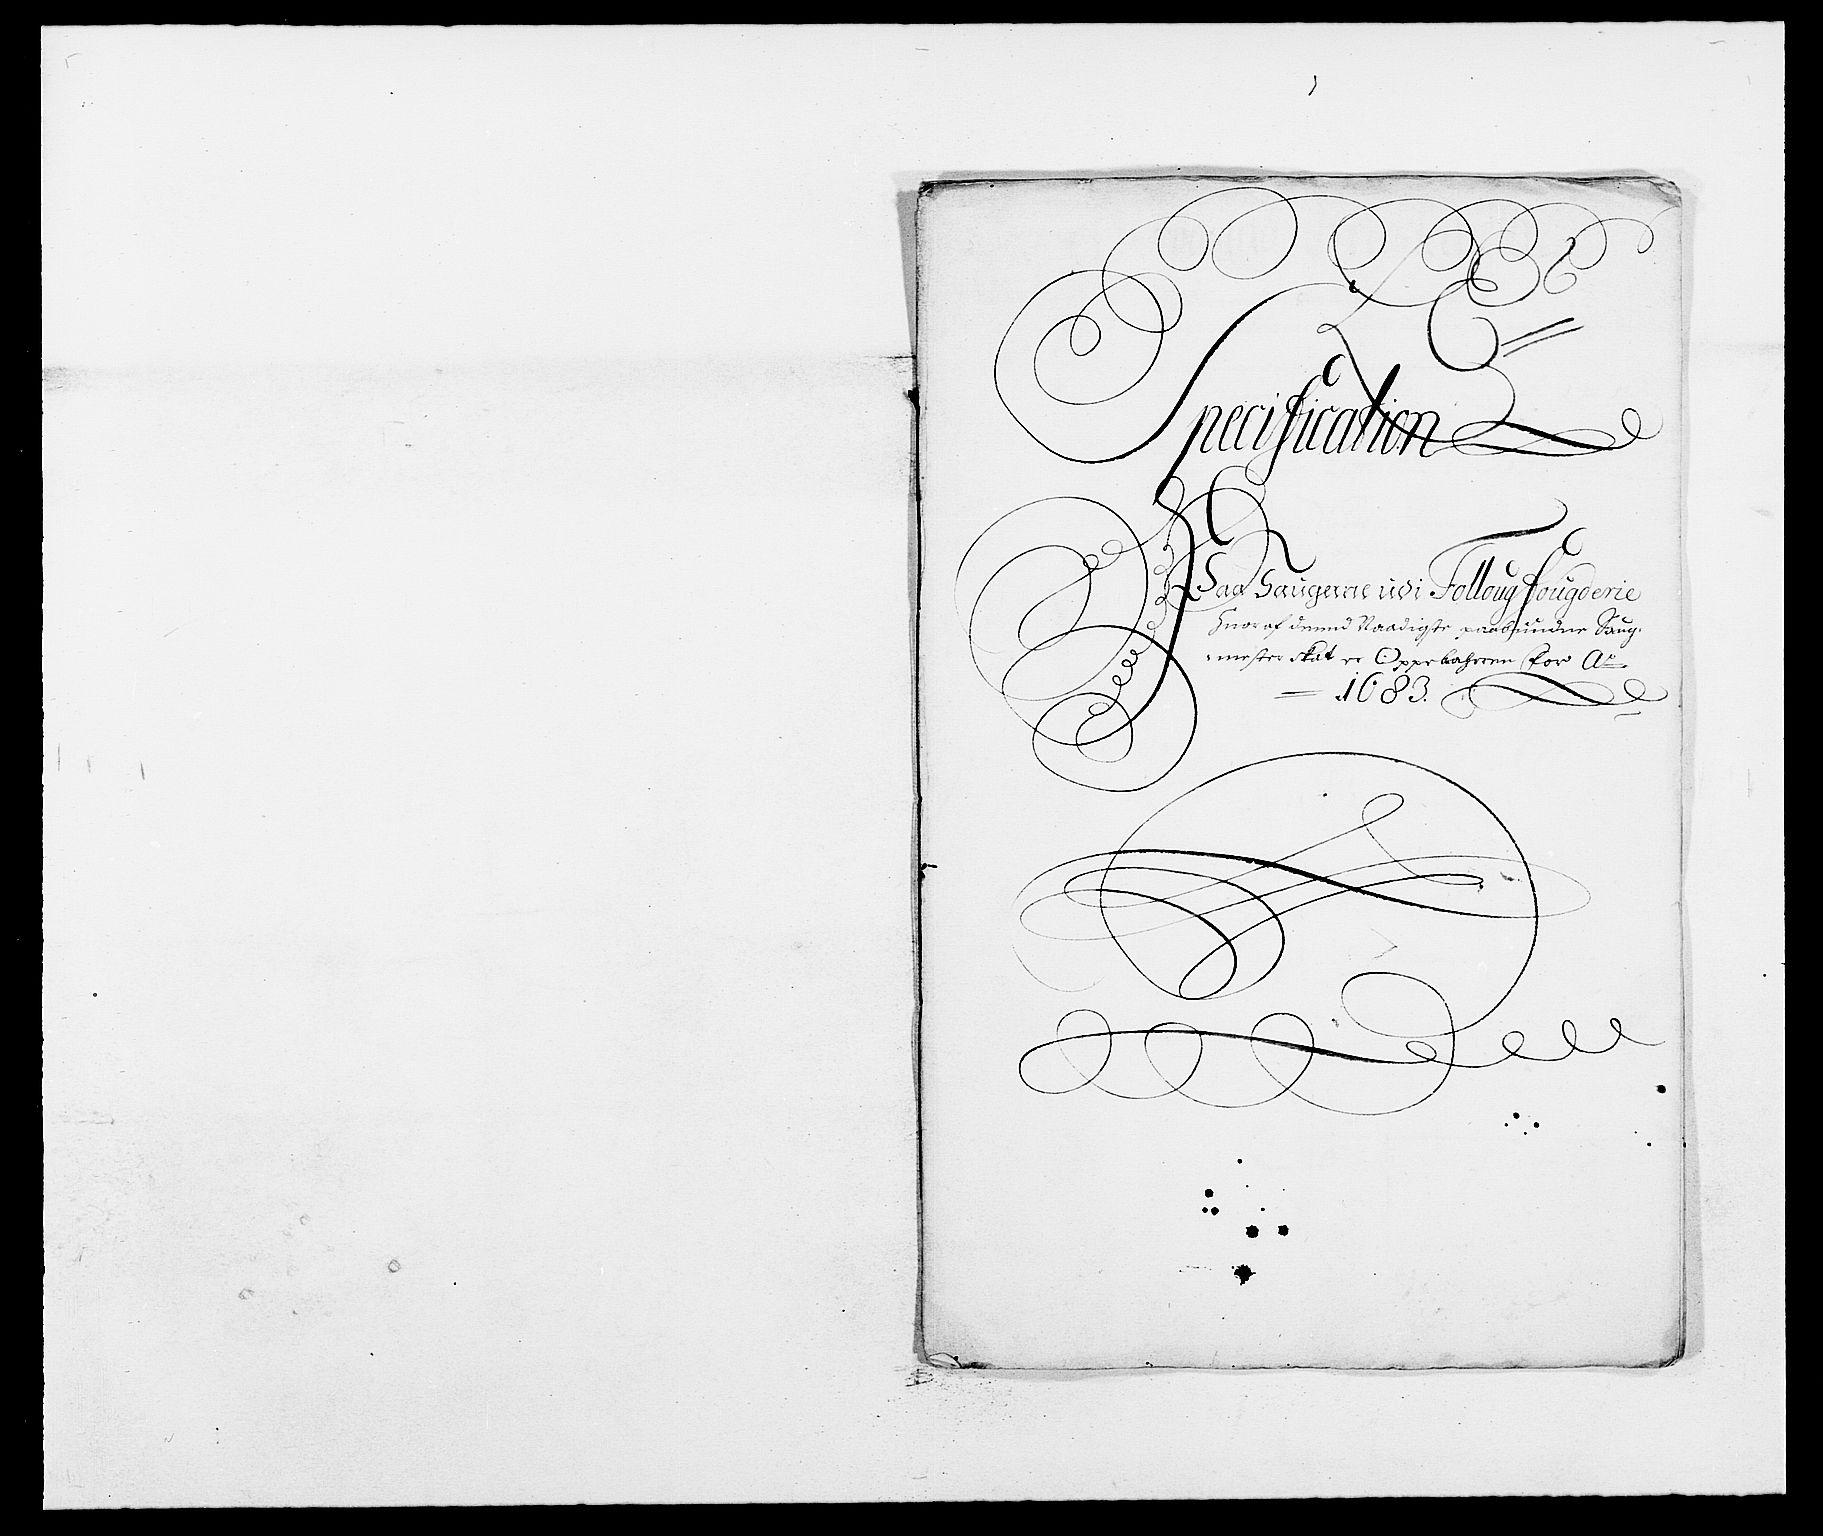 RA, Rentekammeret inntil 1814, Reviderte regnskaper, Fogderegnskap, R09/L0430: Fogderegnskap Follo, 1682-1683, s. 417